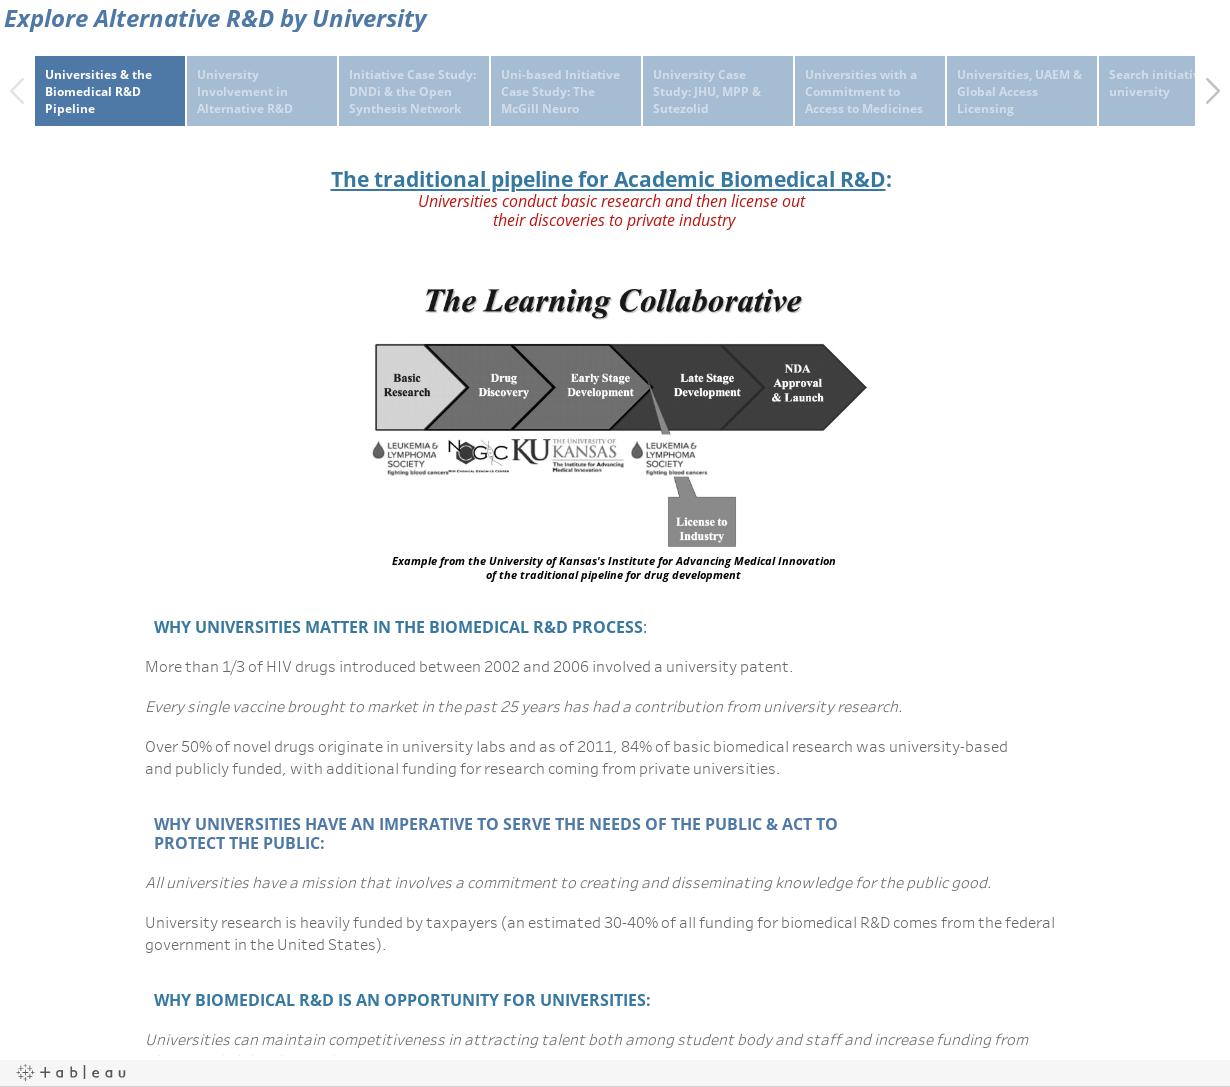 Explore Alternative R&D by University